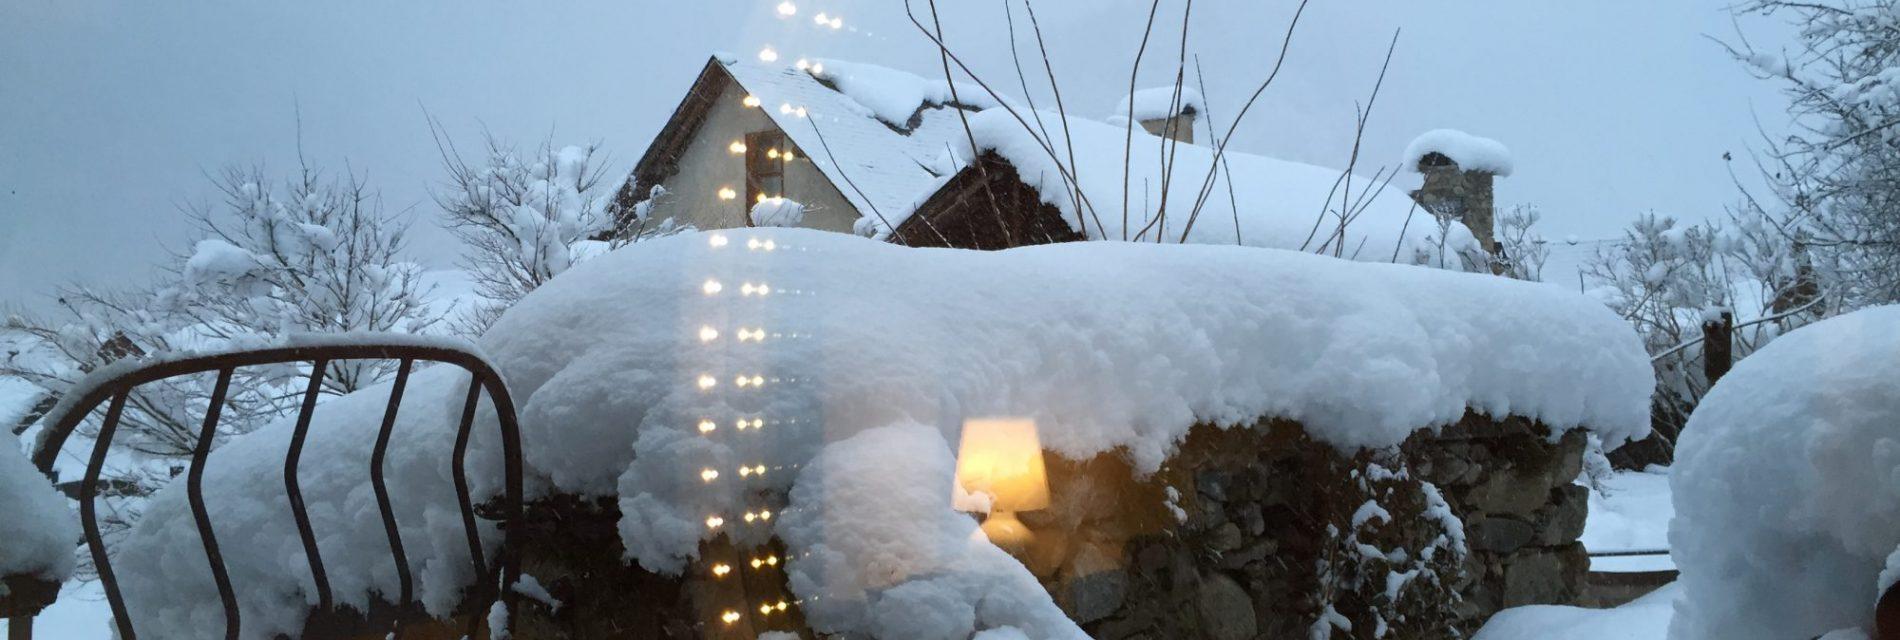 Winter at Eth Bordac